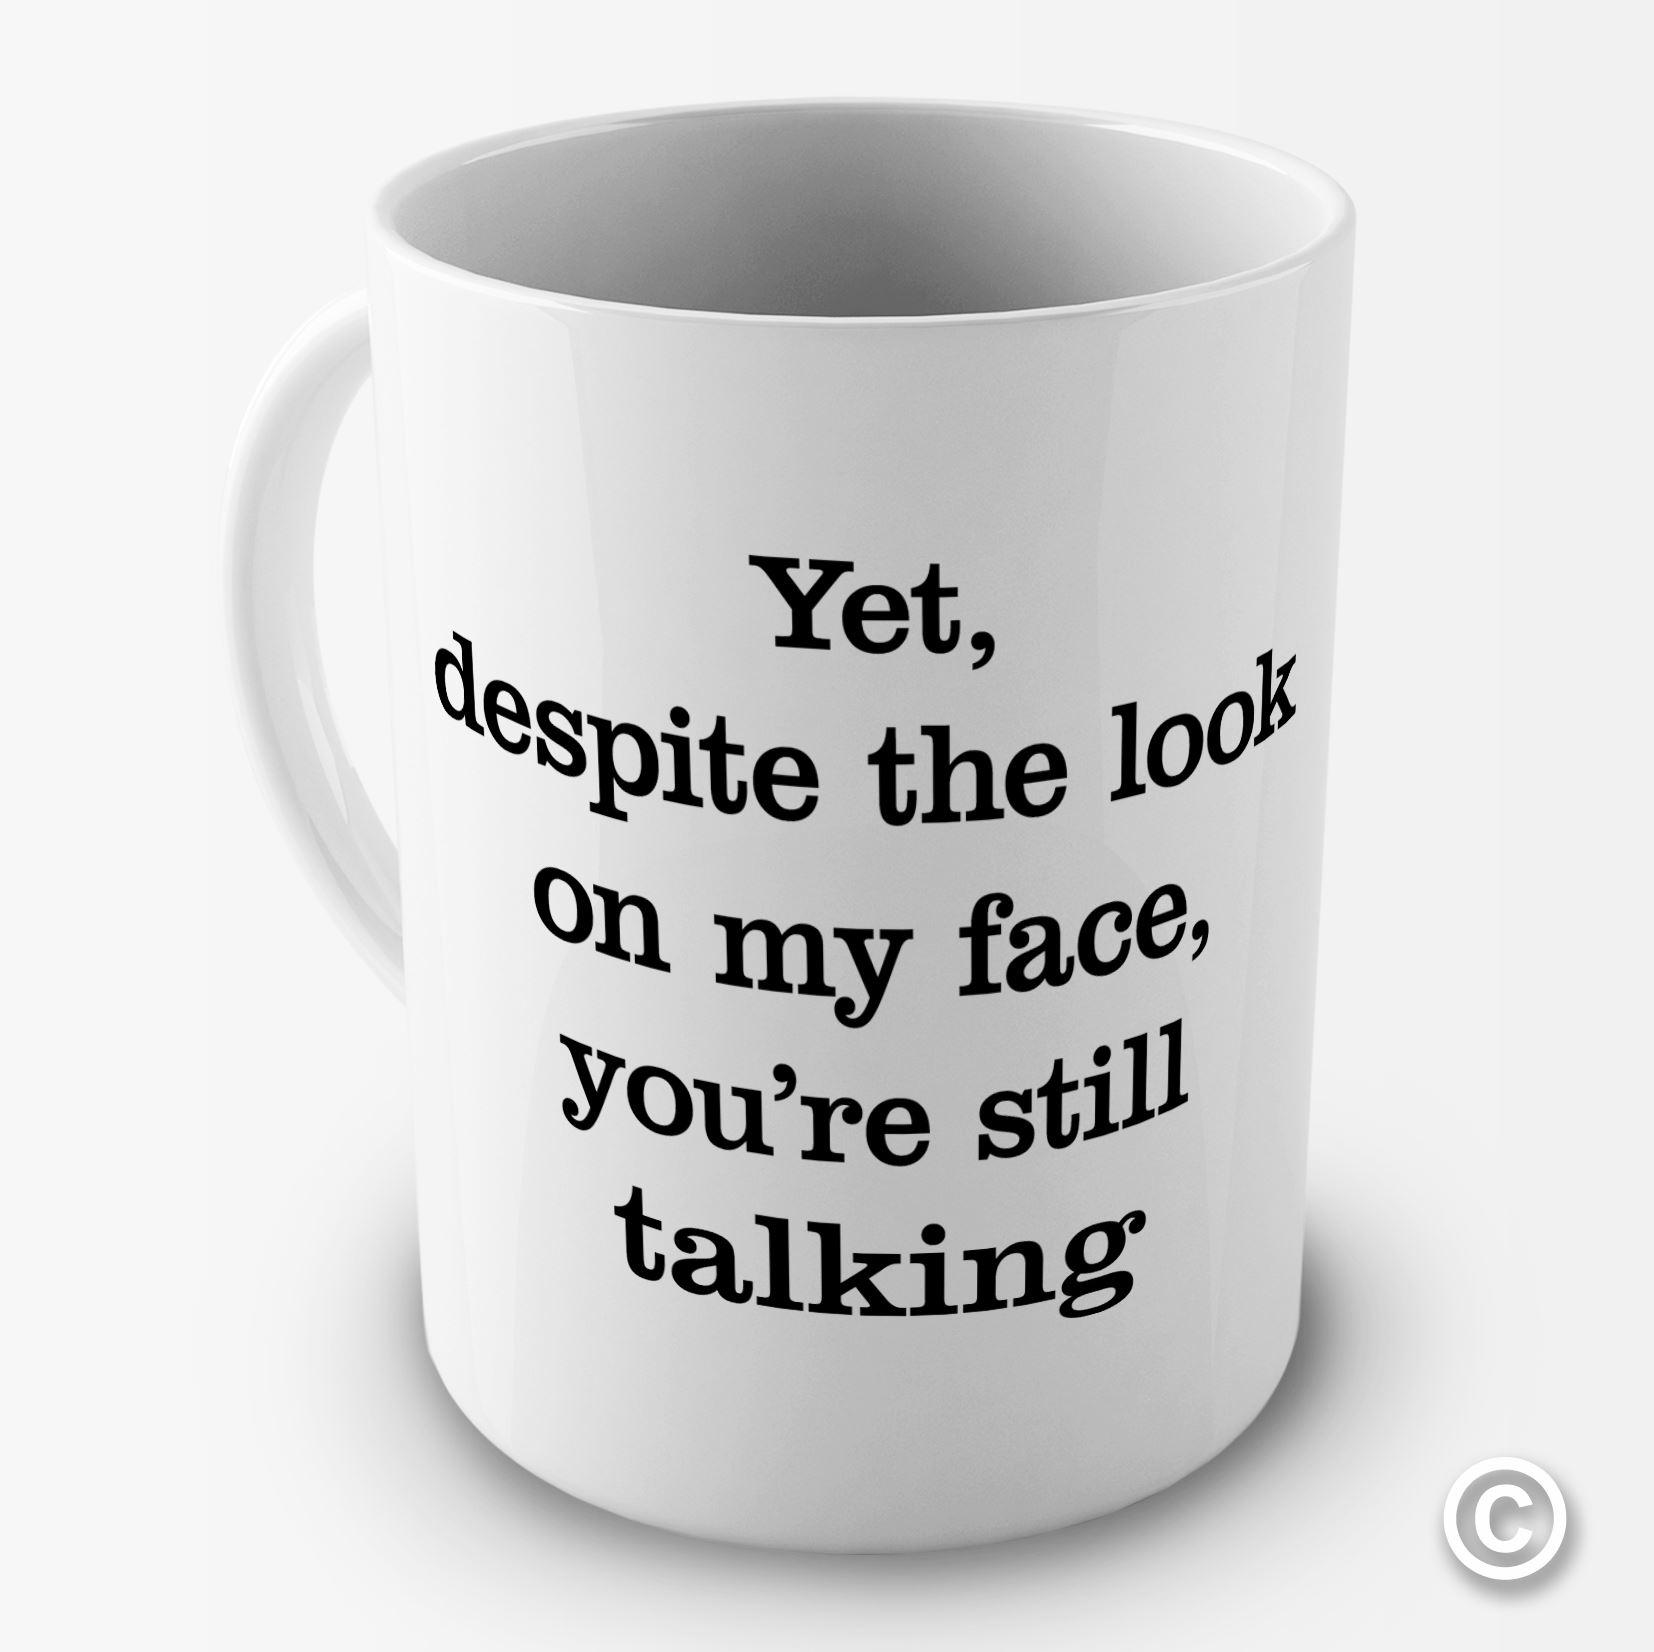 Despite the look on my face youre talking funny mug tea coffee gift mug office ebay - Funny office coffee mugs ...